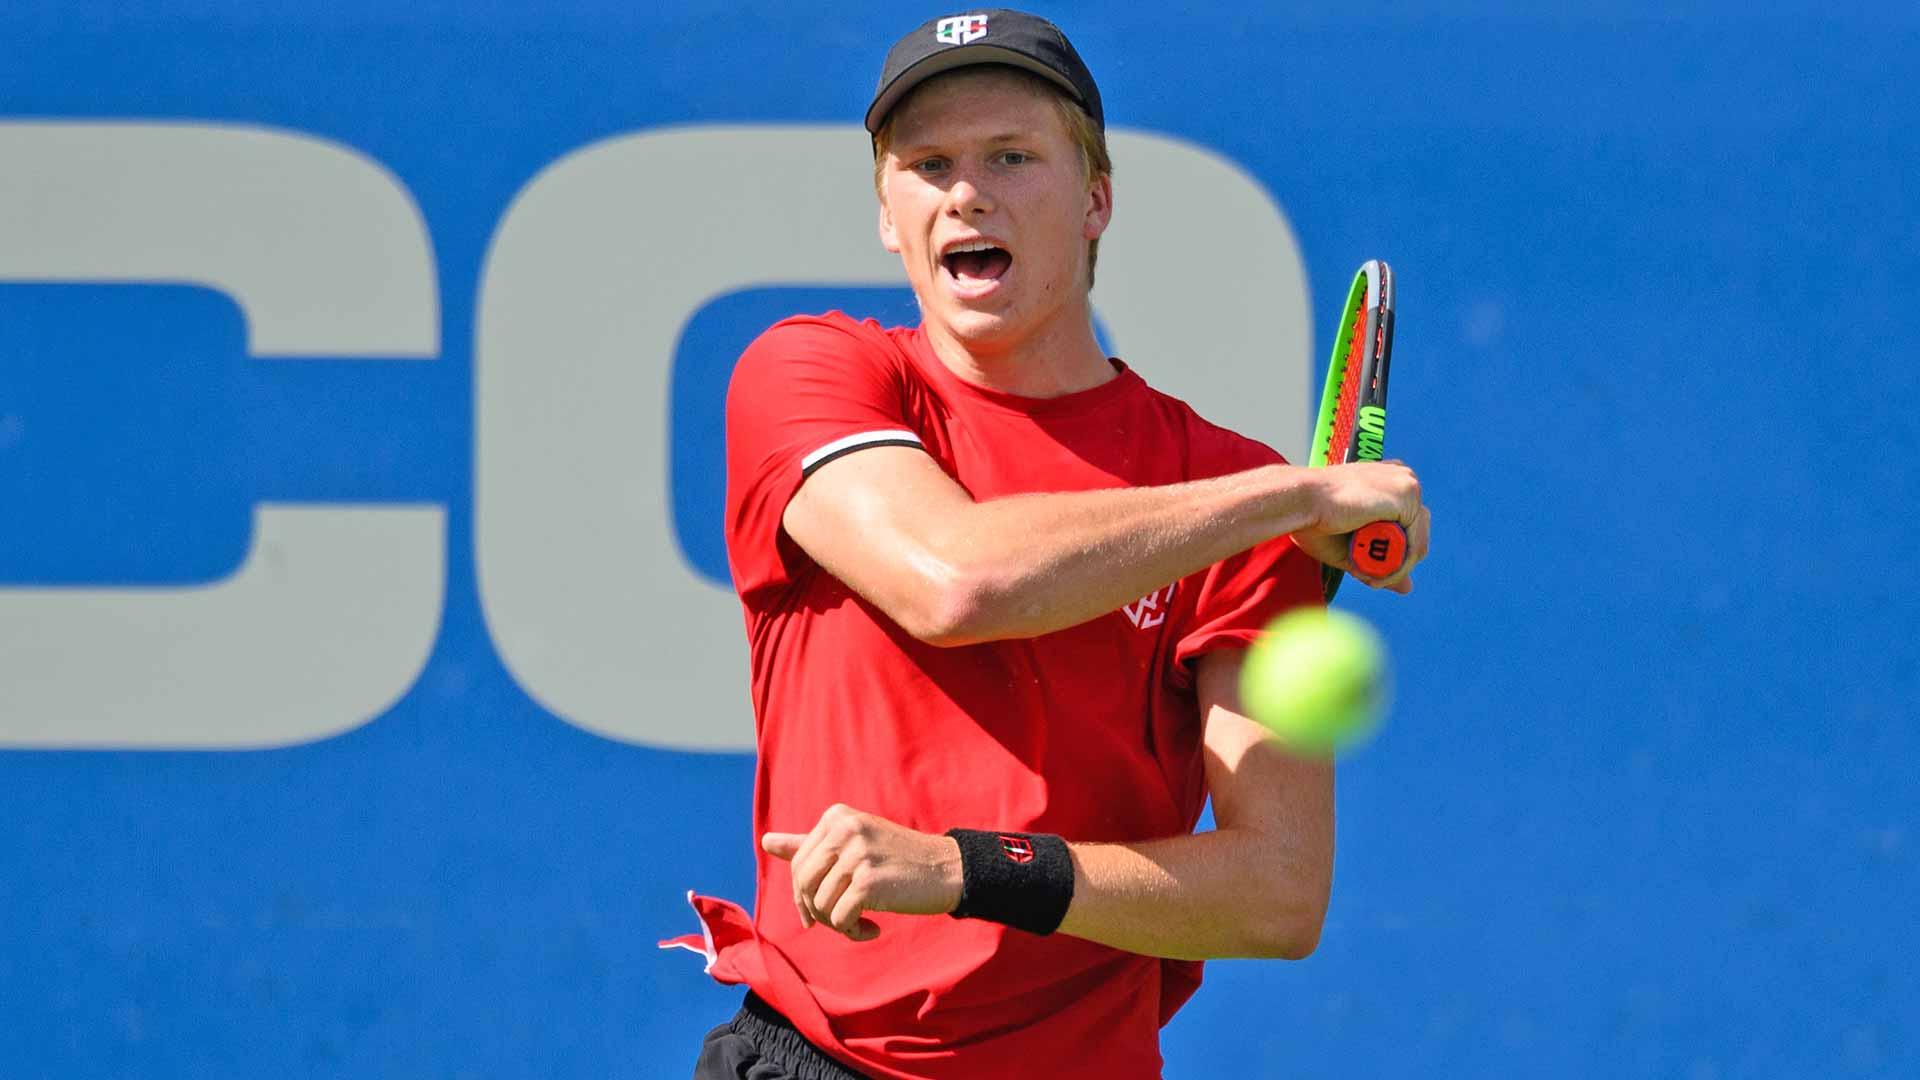 Toronto Open 2021: Jenson Brooksby vs. Nikoloz Basilashvili Tennis Pick and Prediction